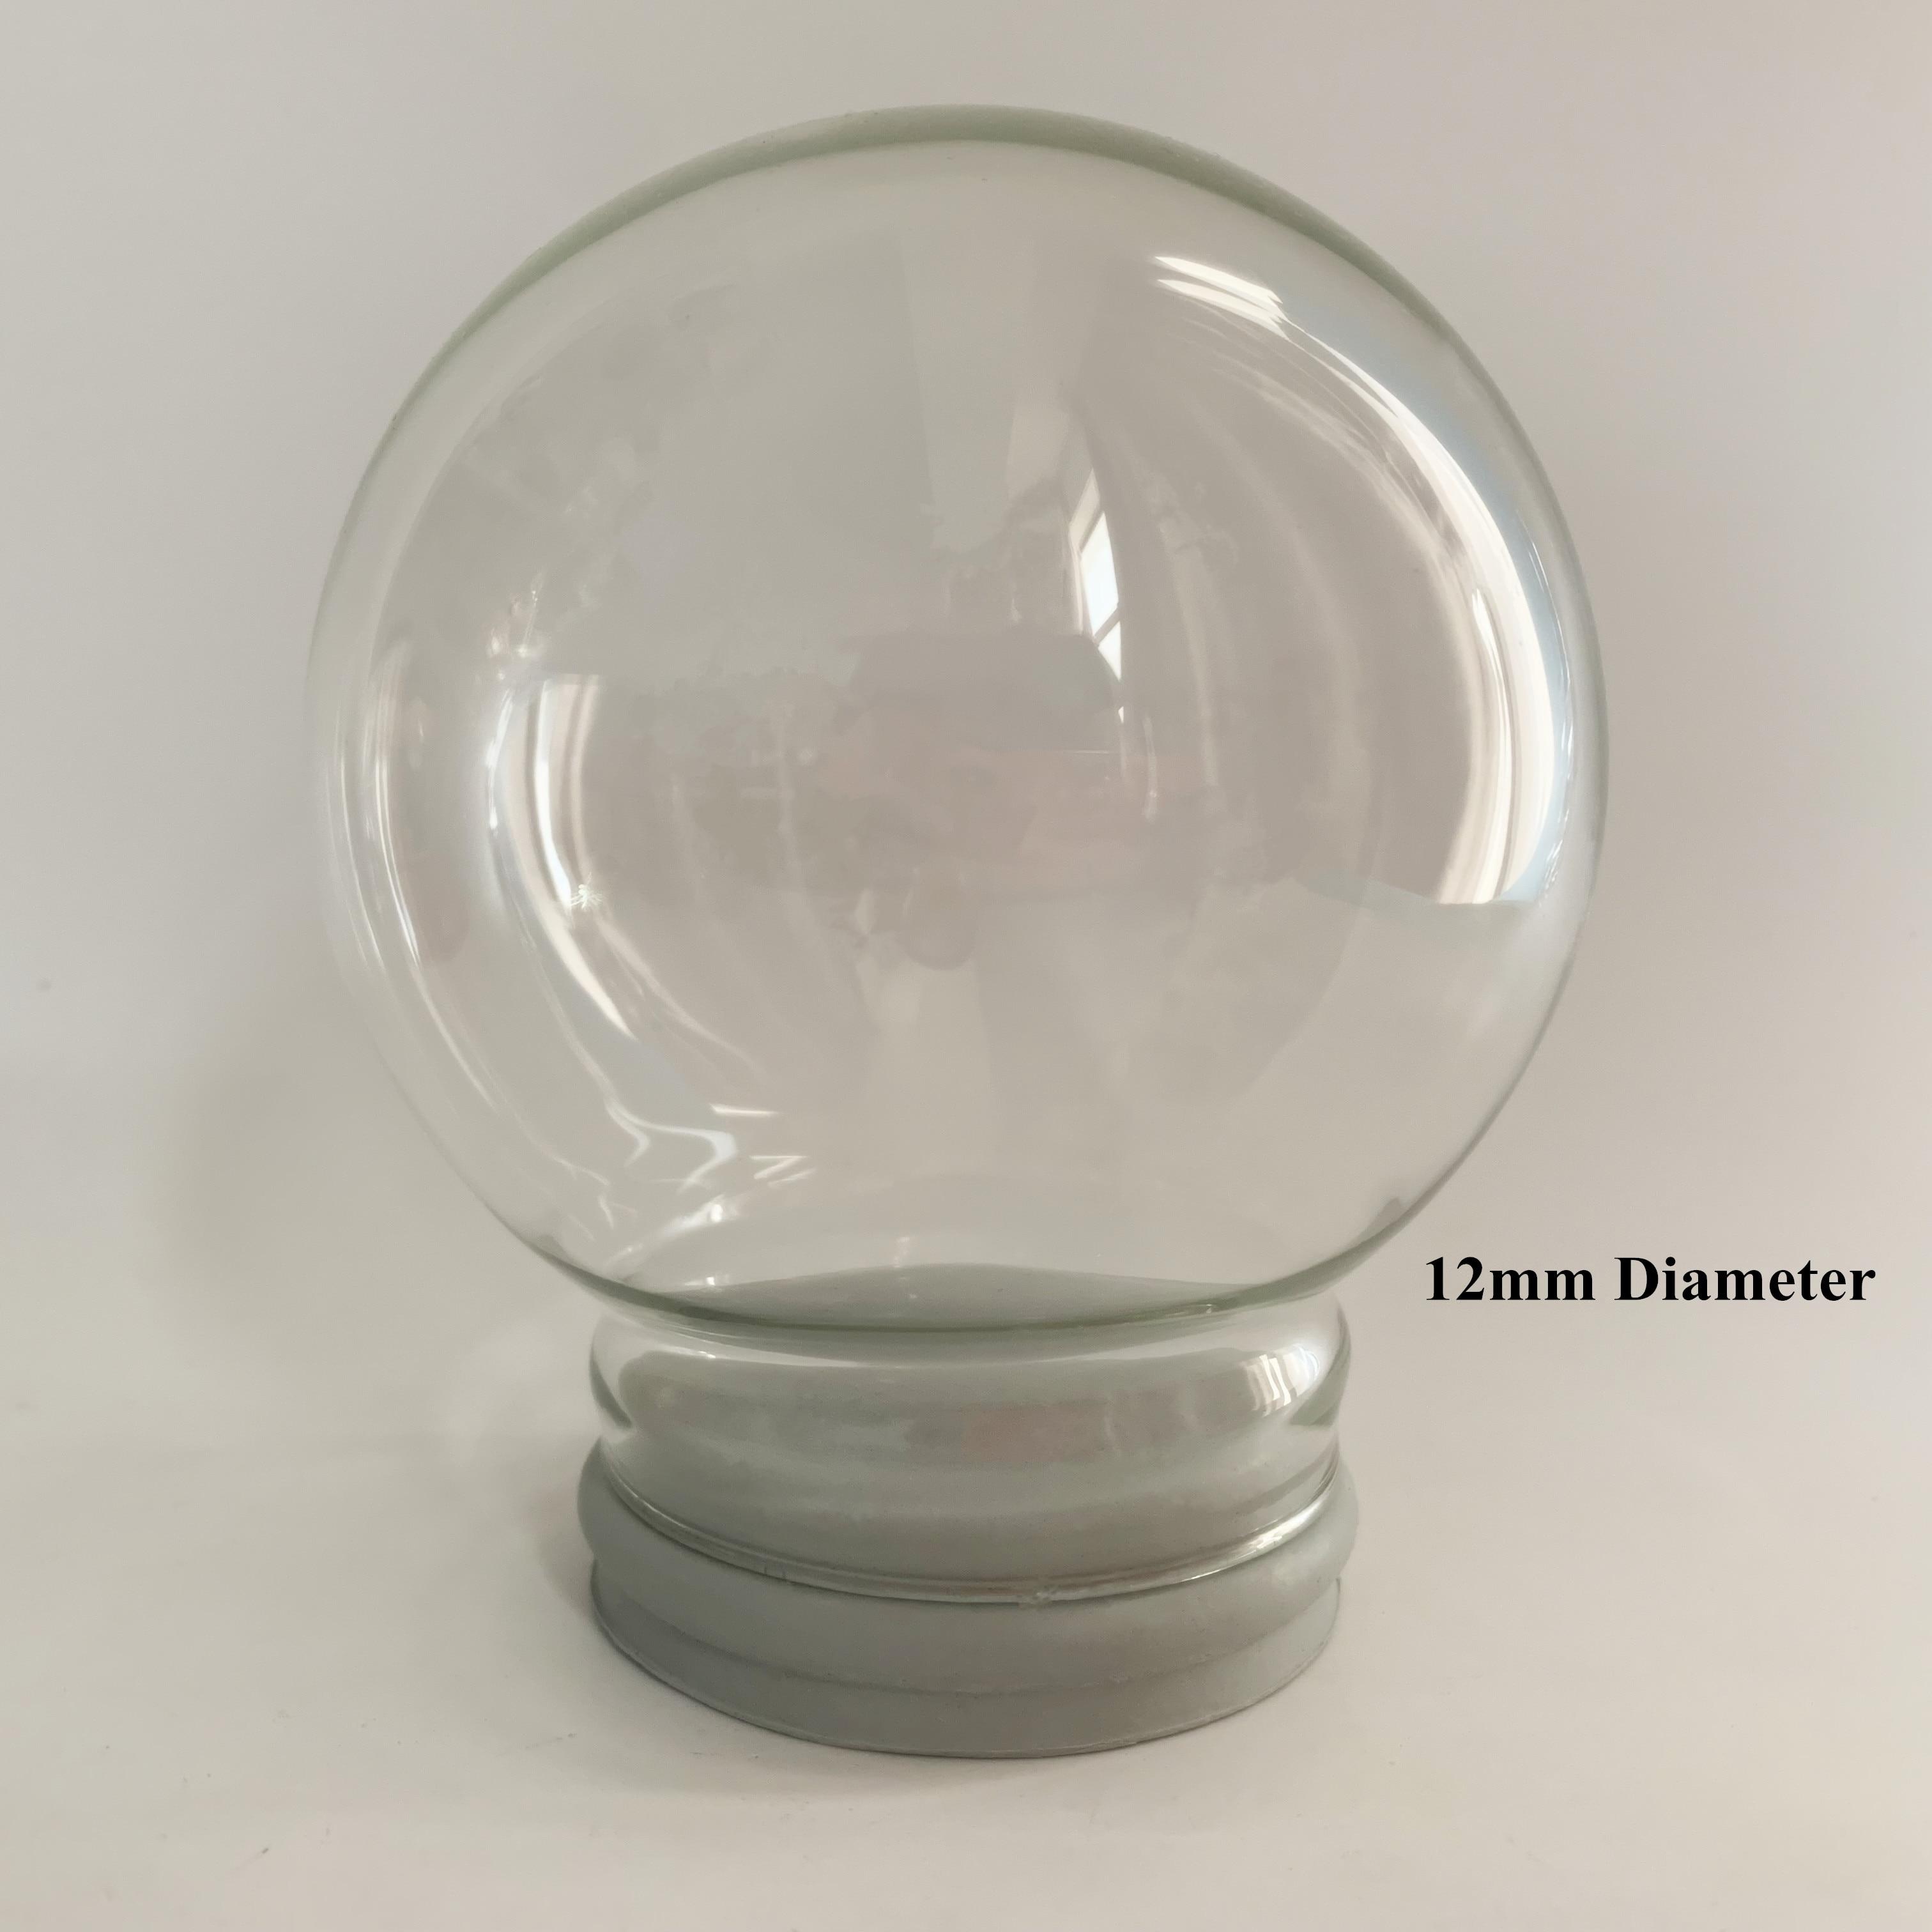 Promotional Gift 120 Mm Diameter DIY Empty Glass Snow Globe Wholesales